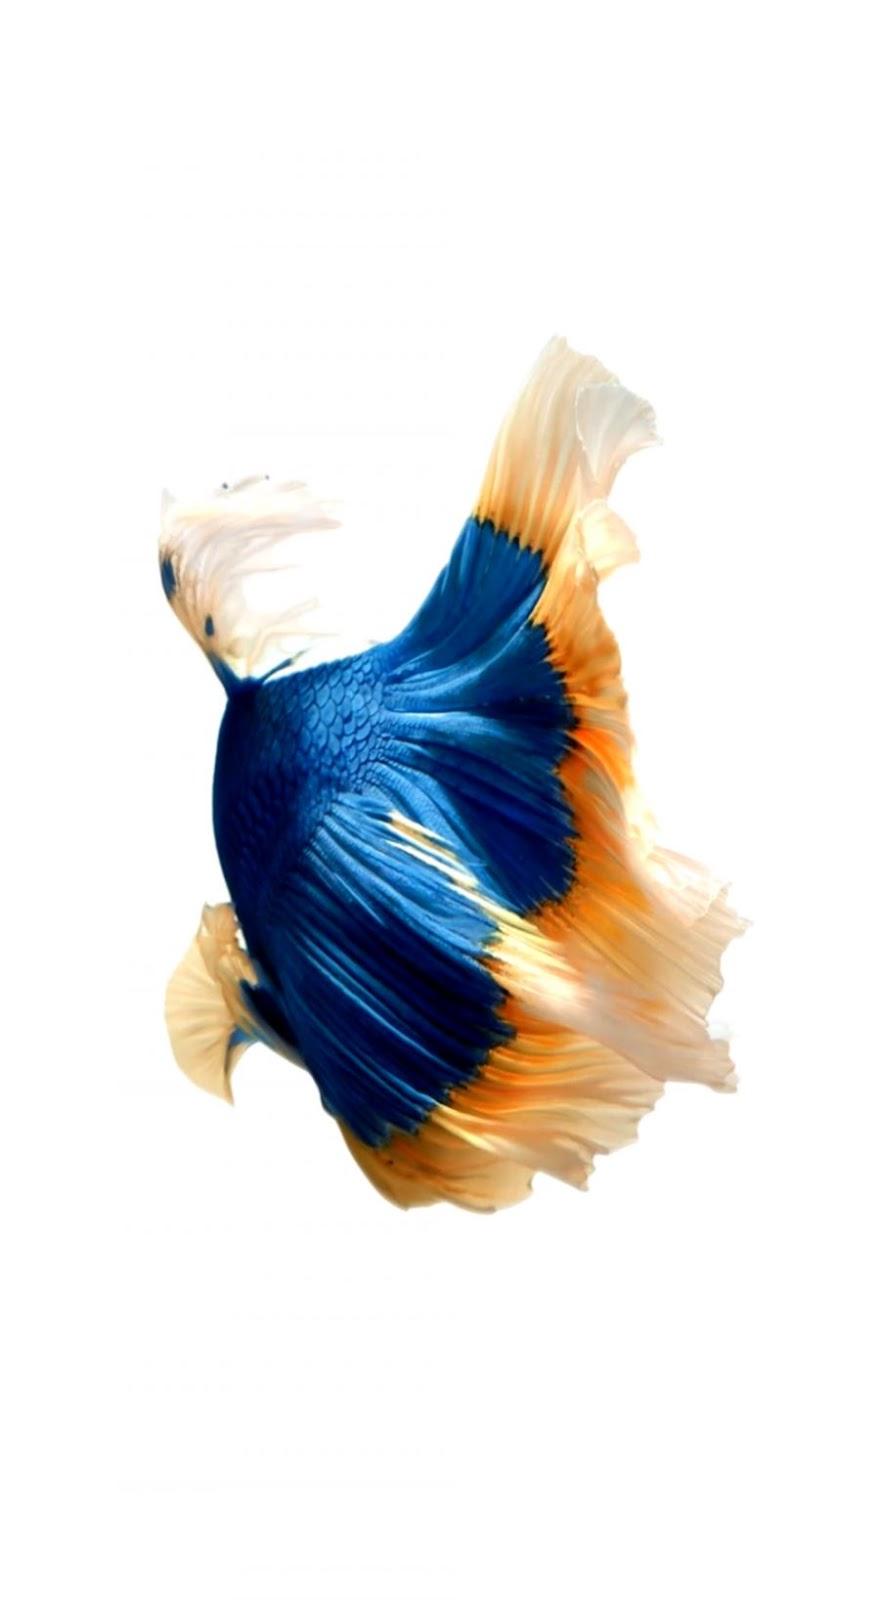 Koi Fish Iphone X Wallpaper   The Bryans Koi Fish